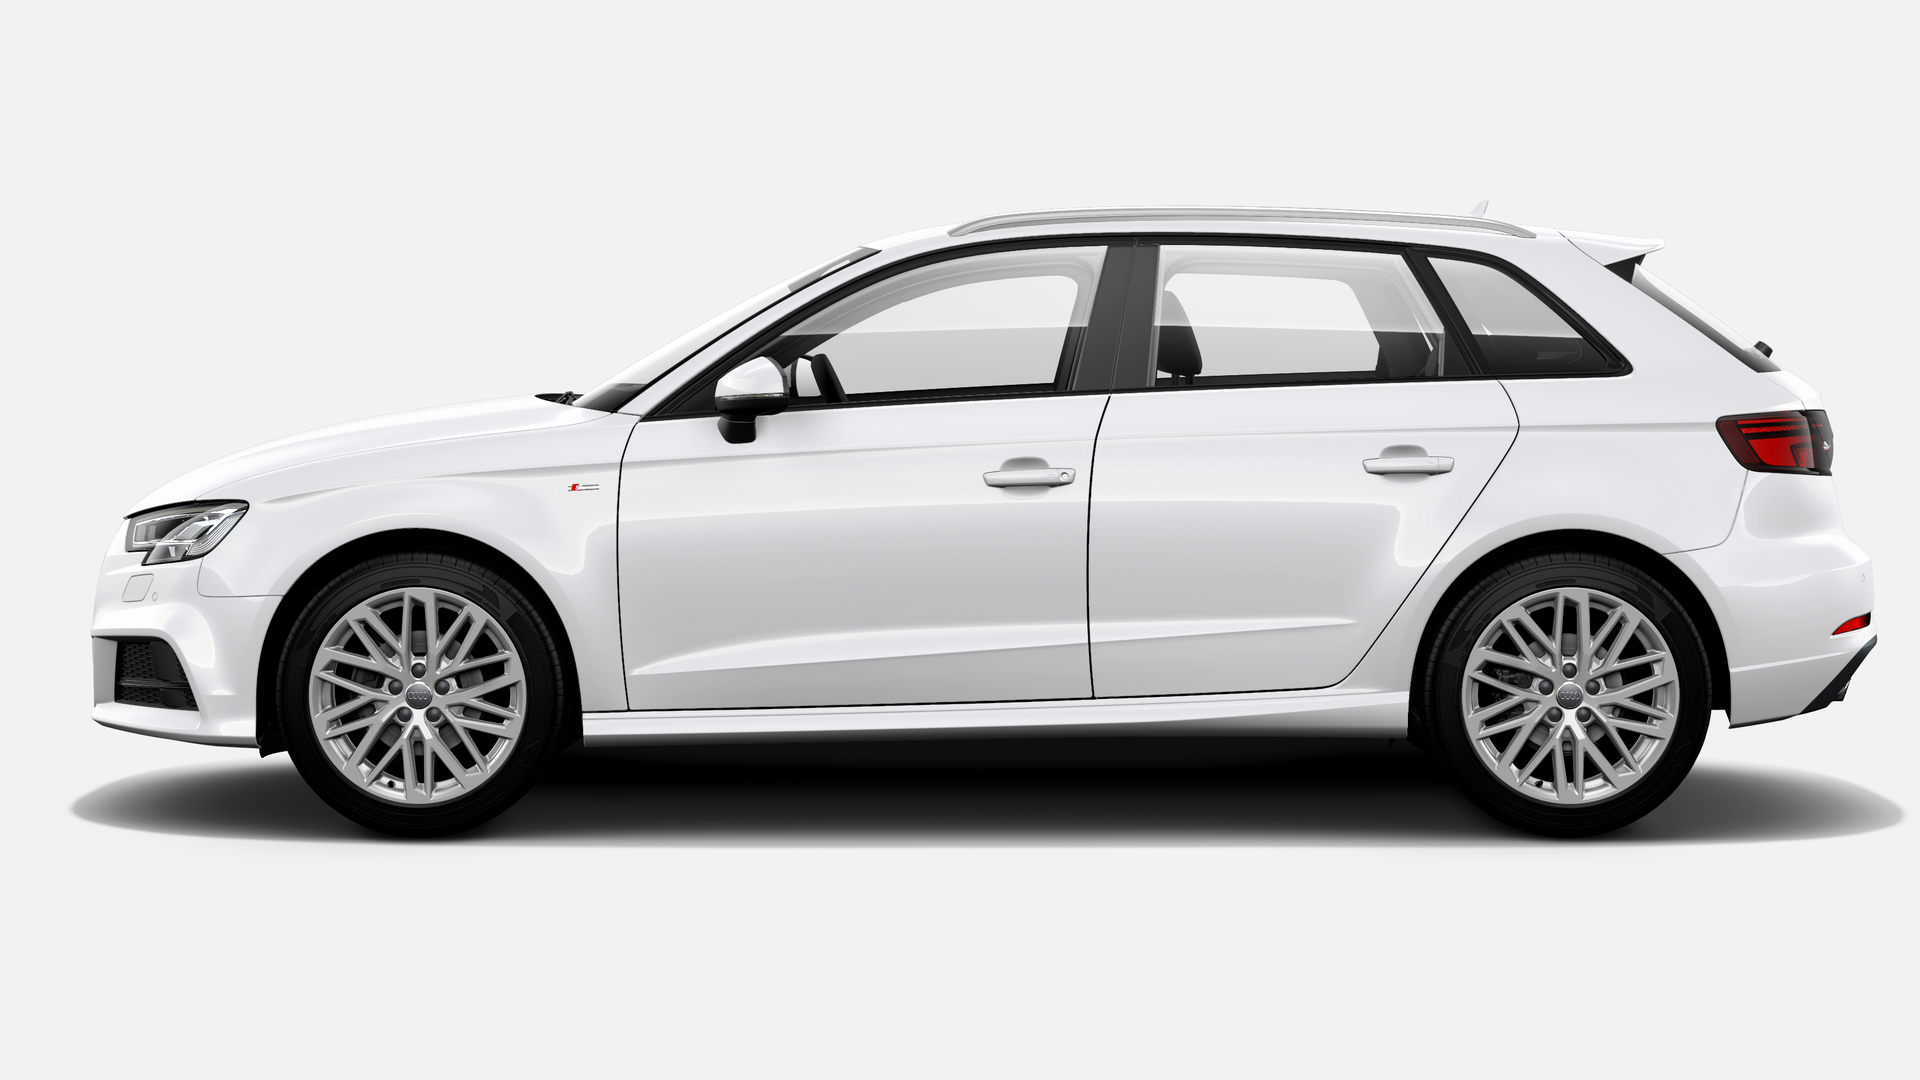 Vista Lateral izquierda de Audi A3 Sportback 30 TDI S line 85 kW (116 CV)